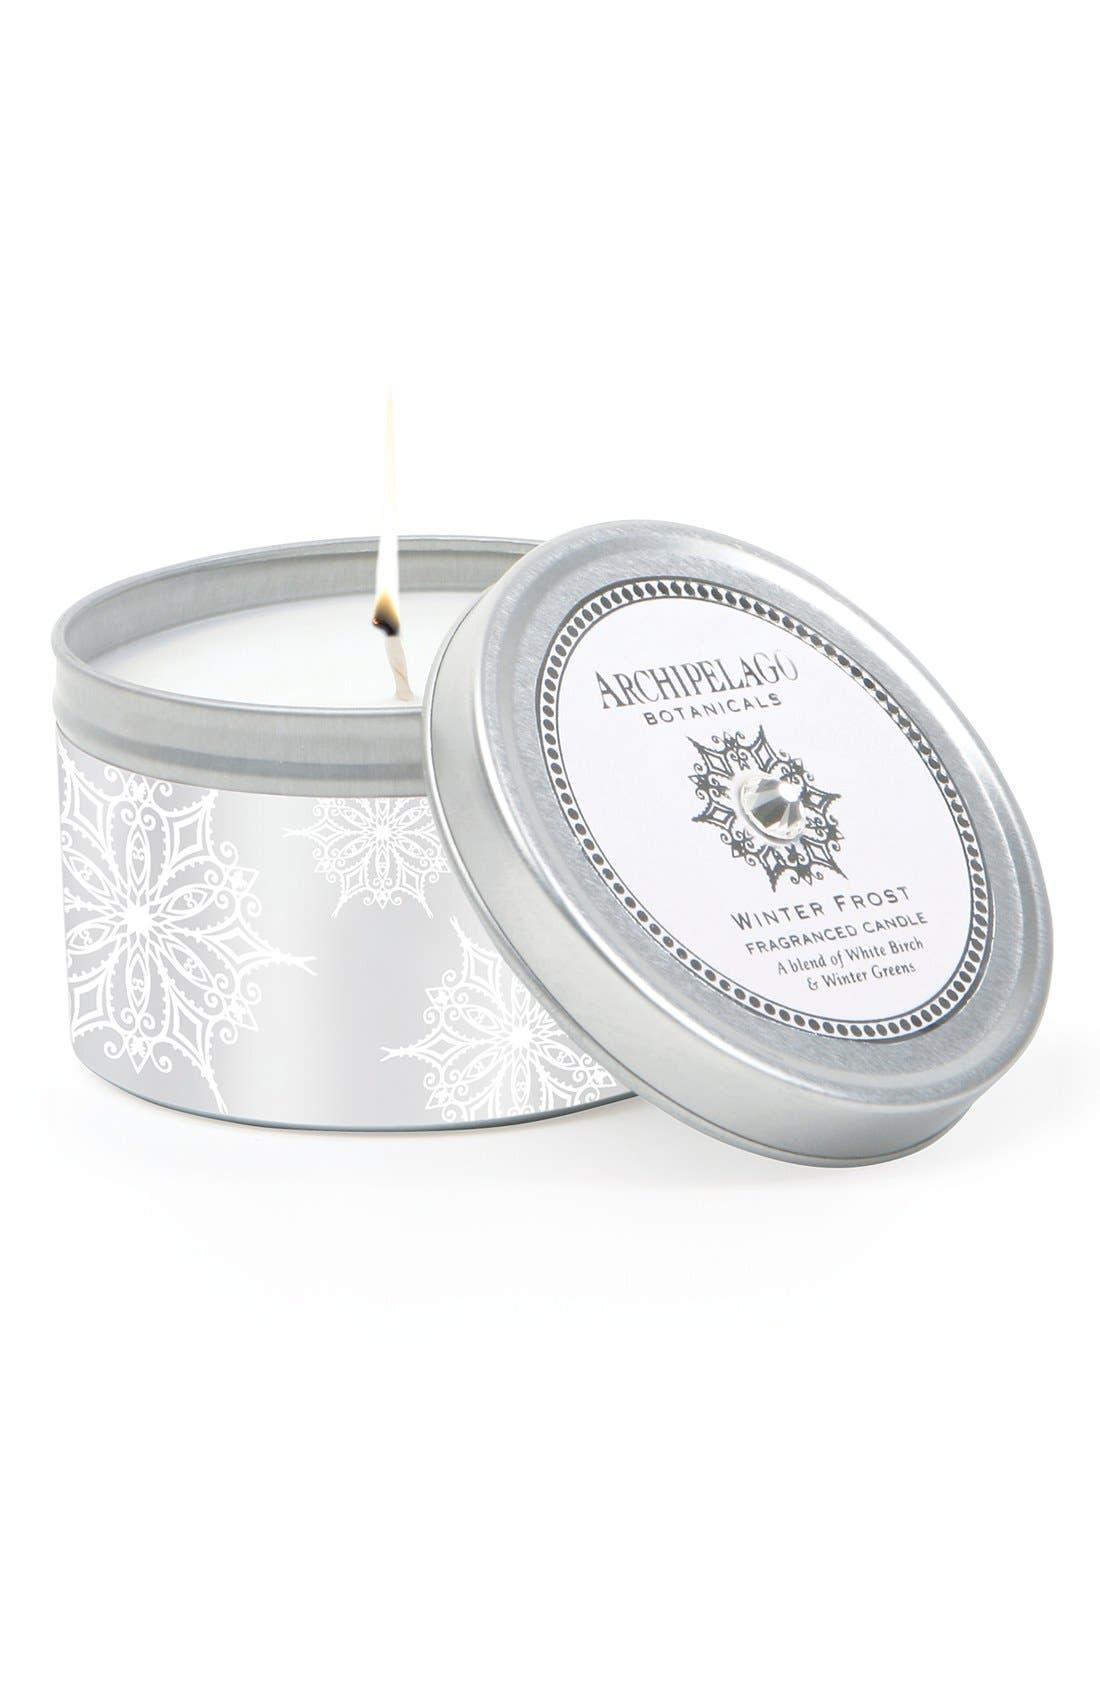 Main Image - Archipelago Botanicals 'Winter Frost' Travel Tin Candle